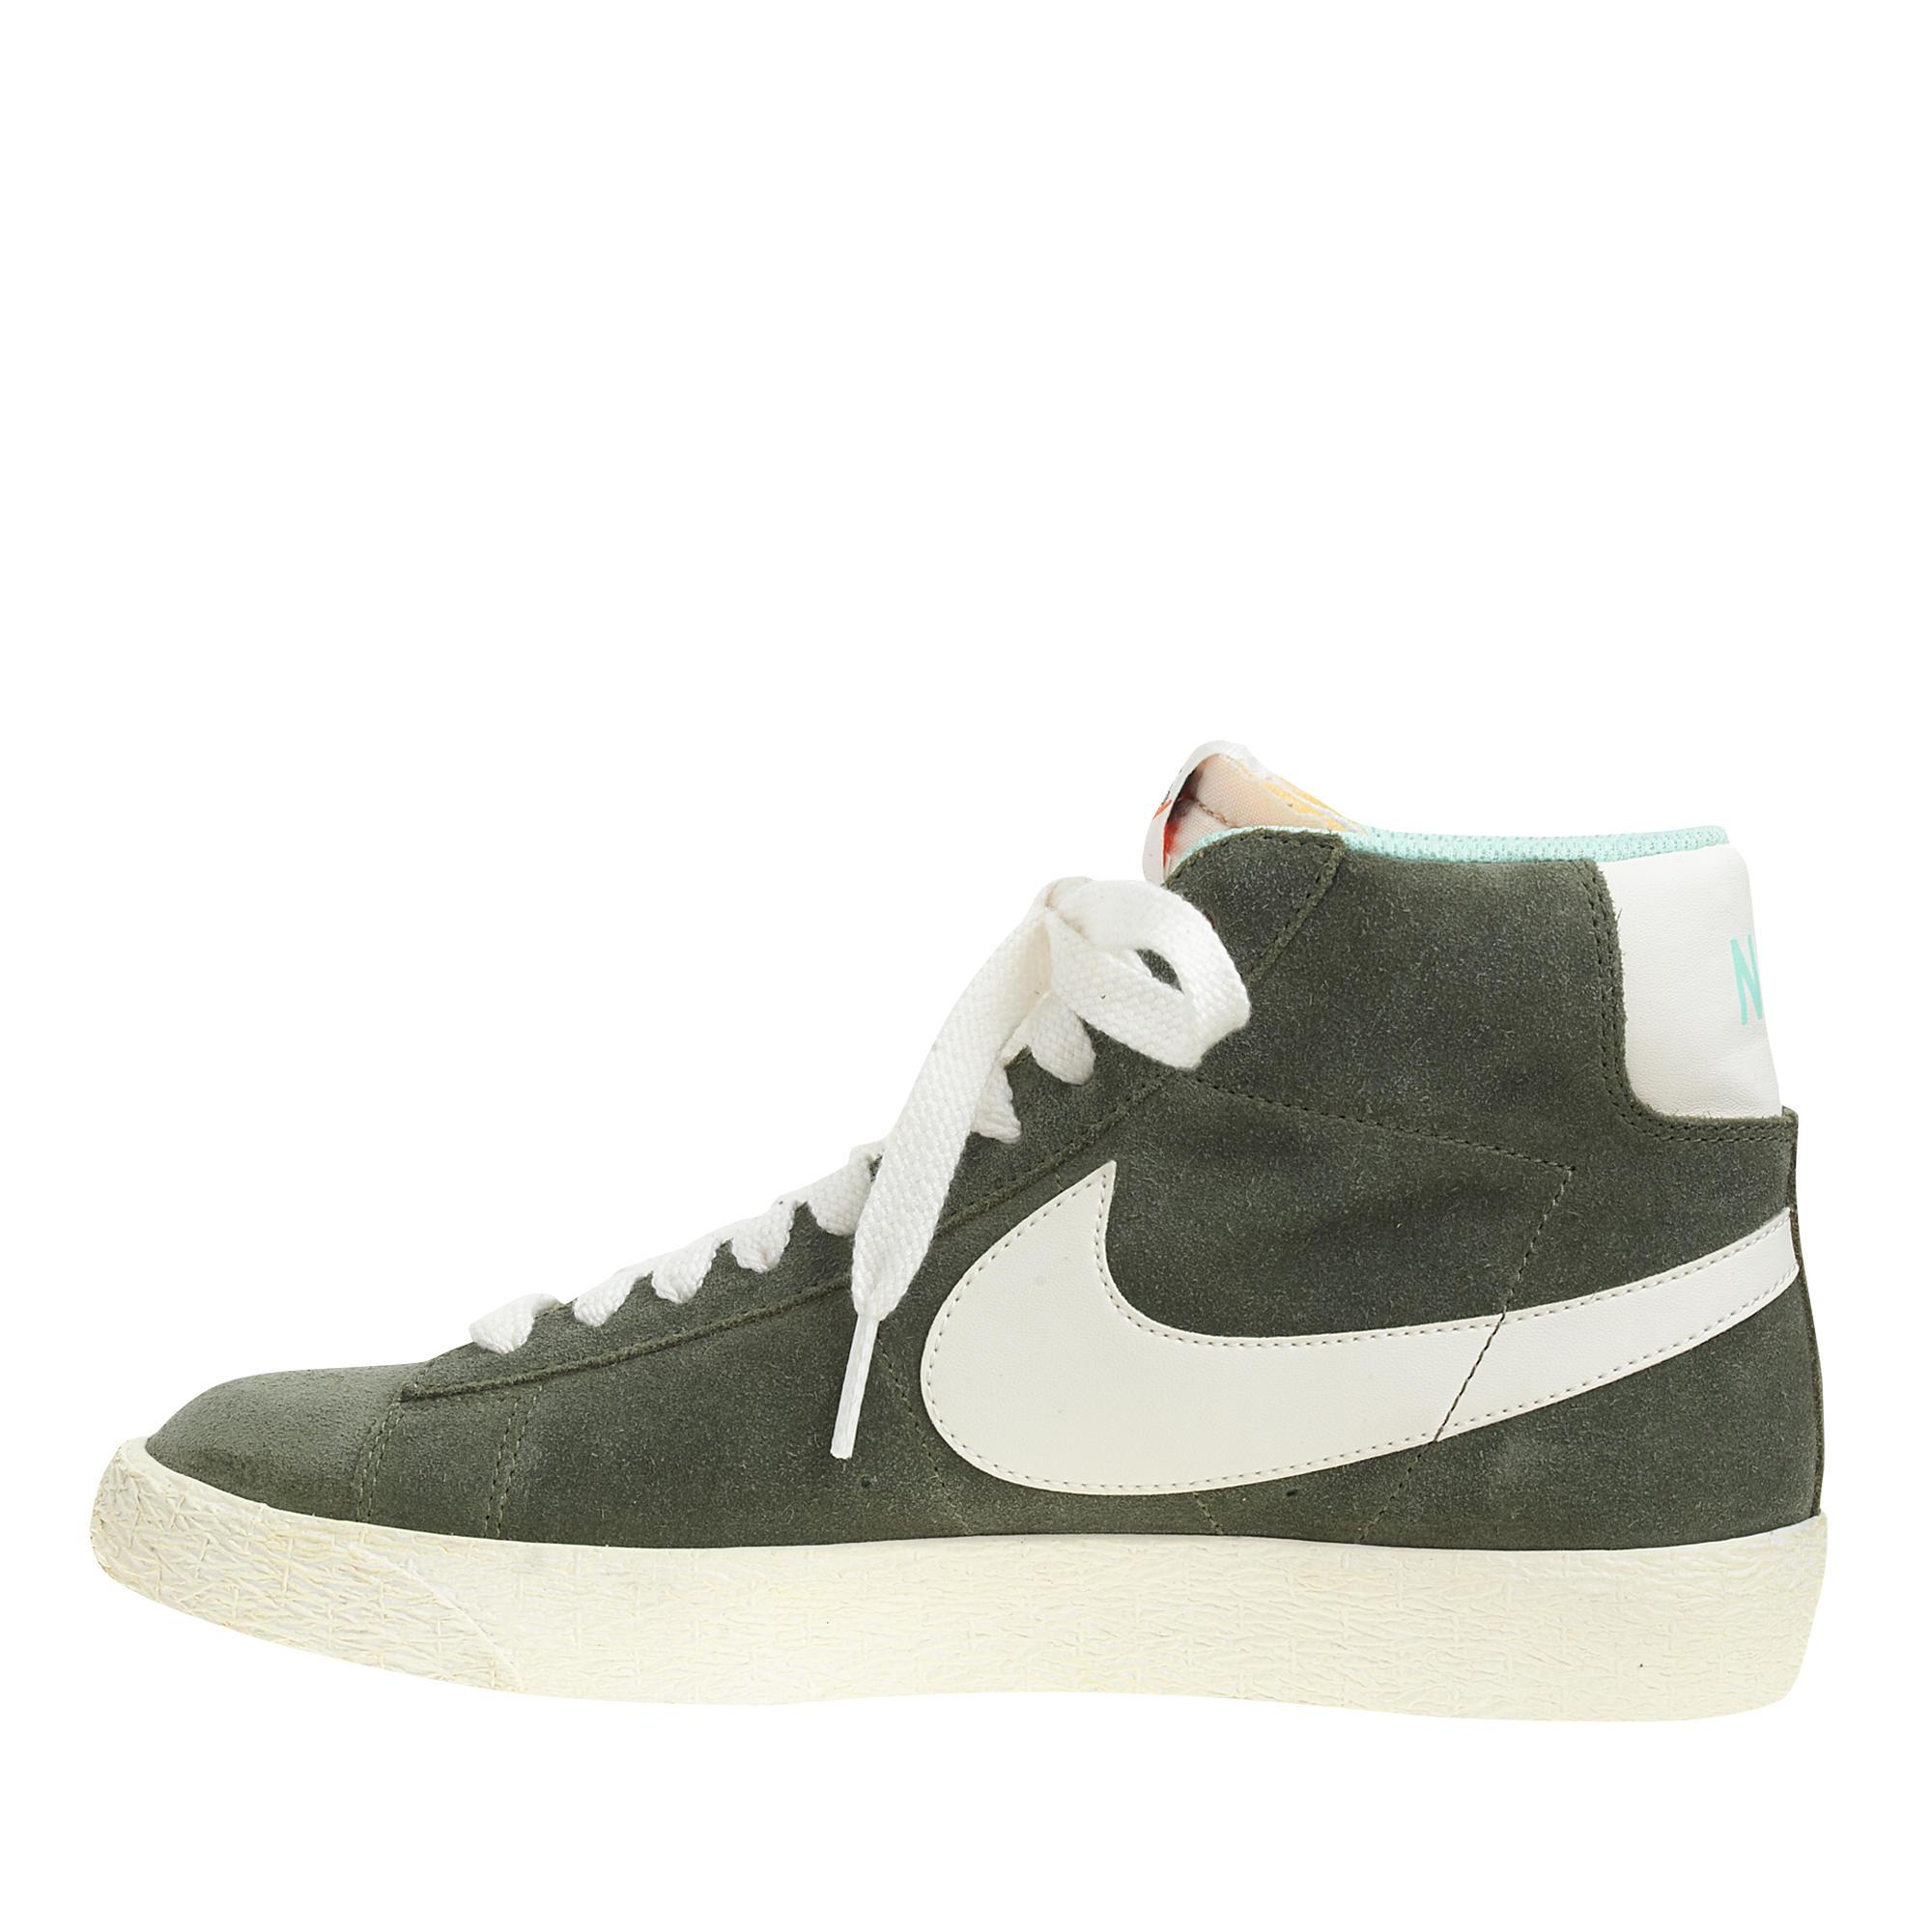 on sale arrives new appearance Women's Nike Suede Blazer Mid Vintage Sneakers